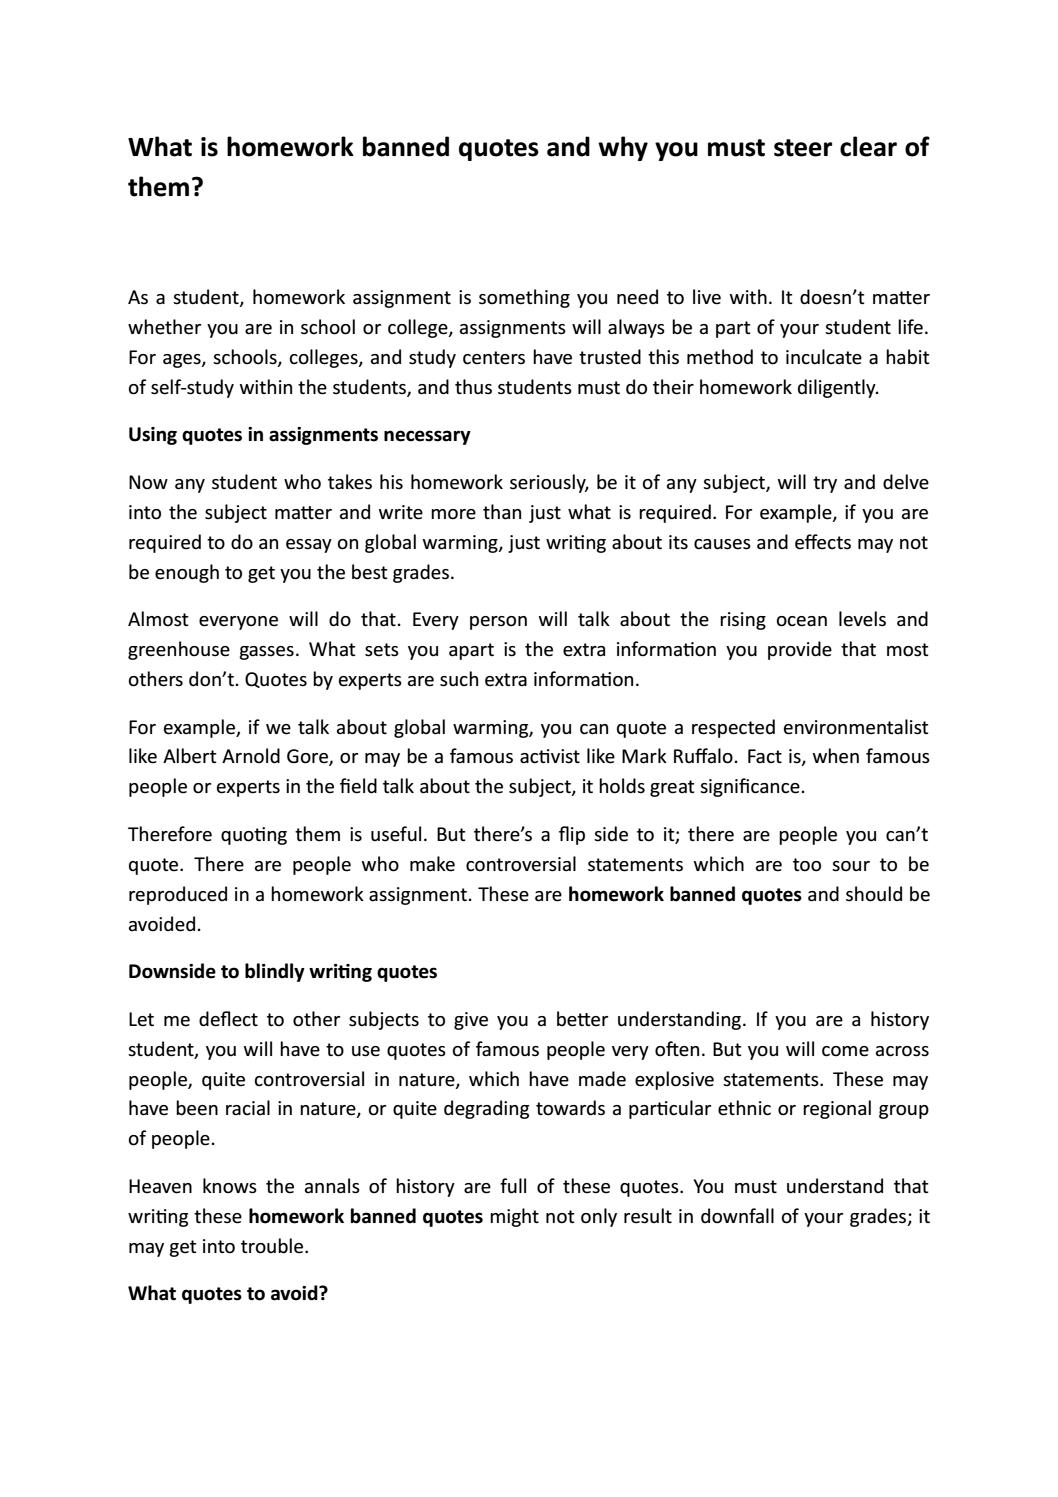 Financial services associate resume